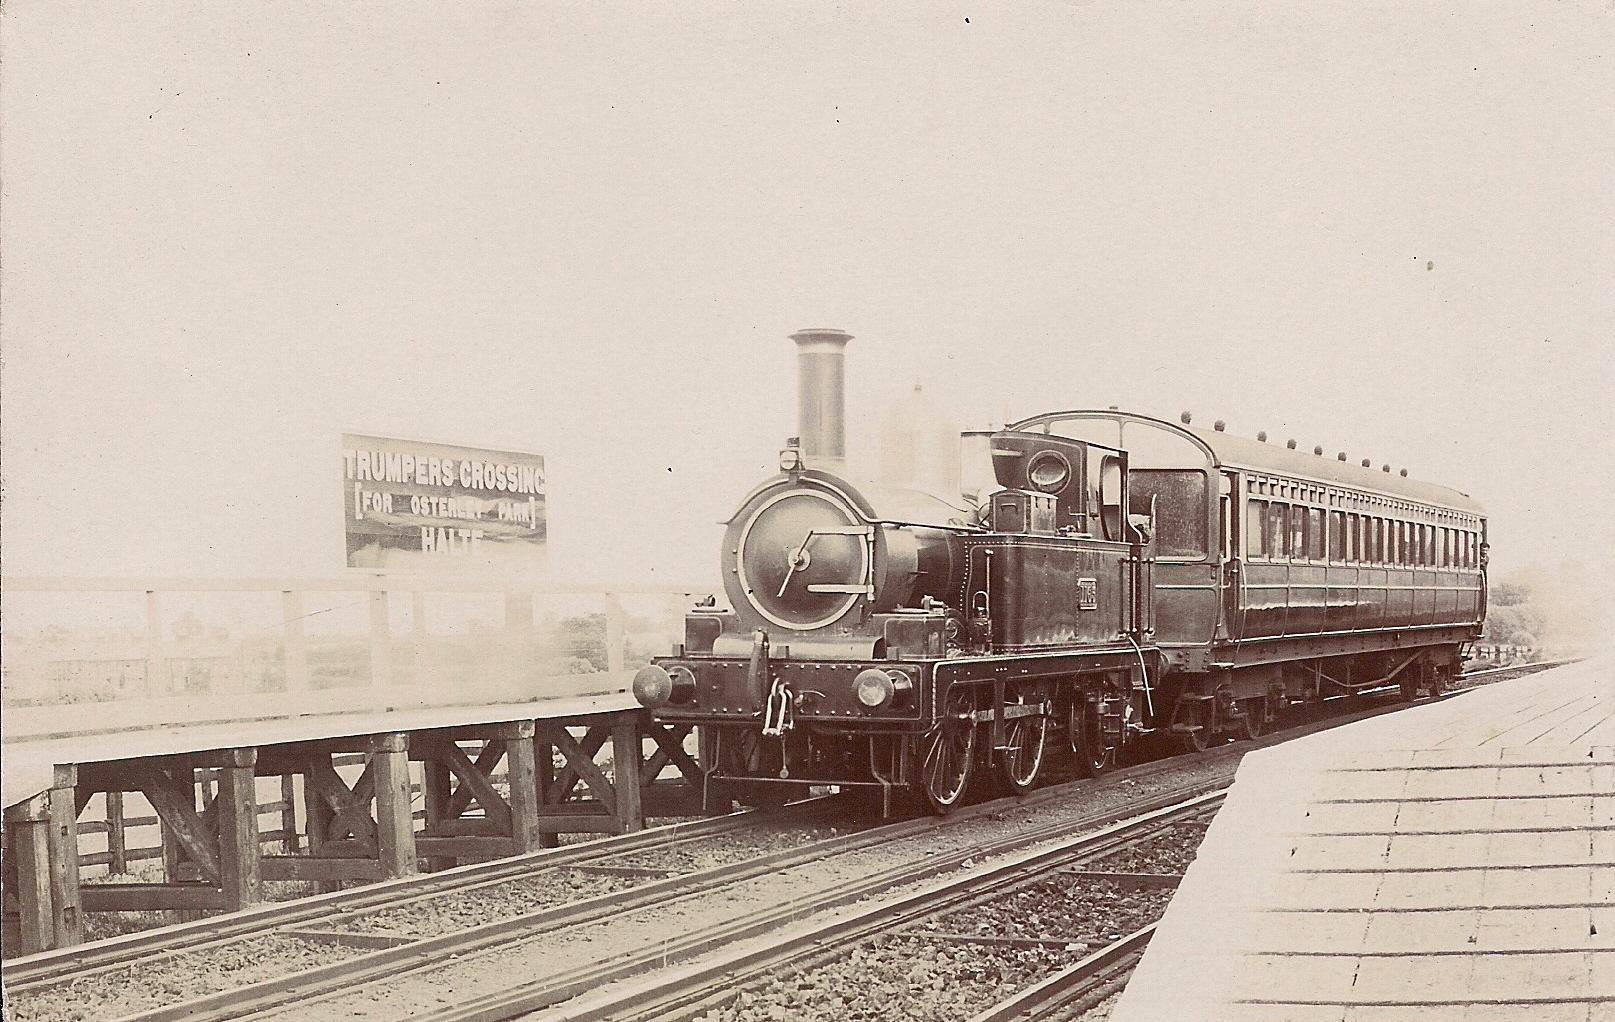 GWR. Brentham Greenford 1 Perivale Railway Station Photo Park Royal Line